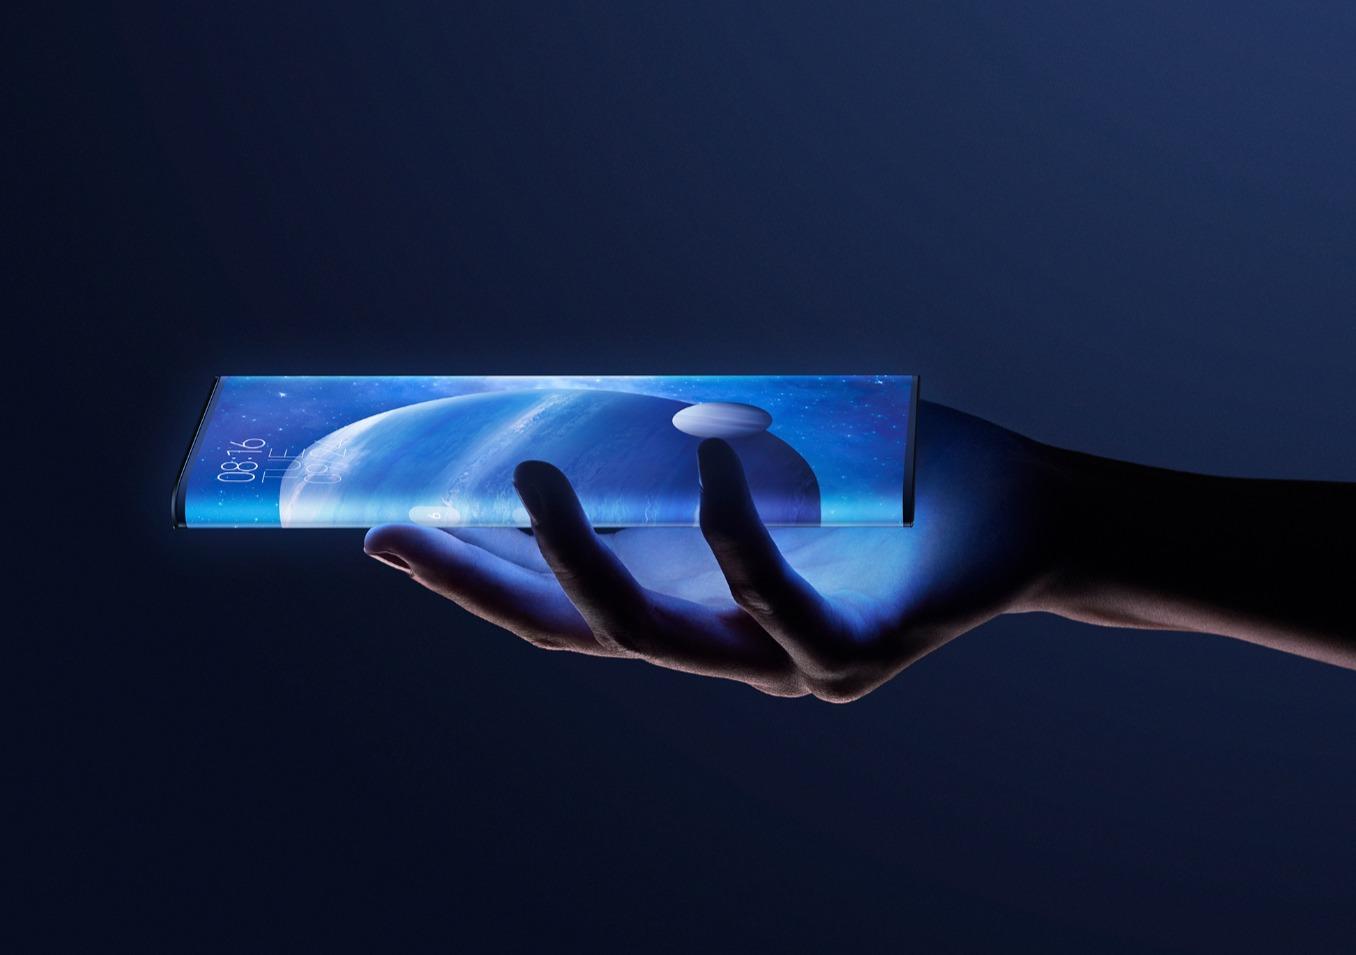 Xiaomi: Angebot an 5G-Smartphones wird explodieren